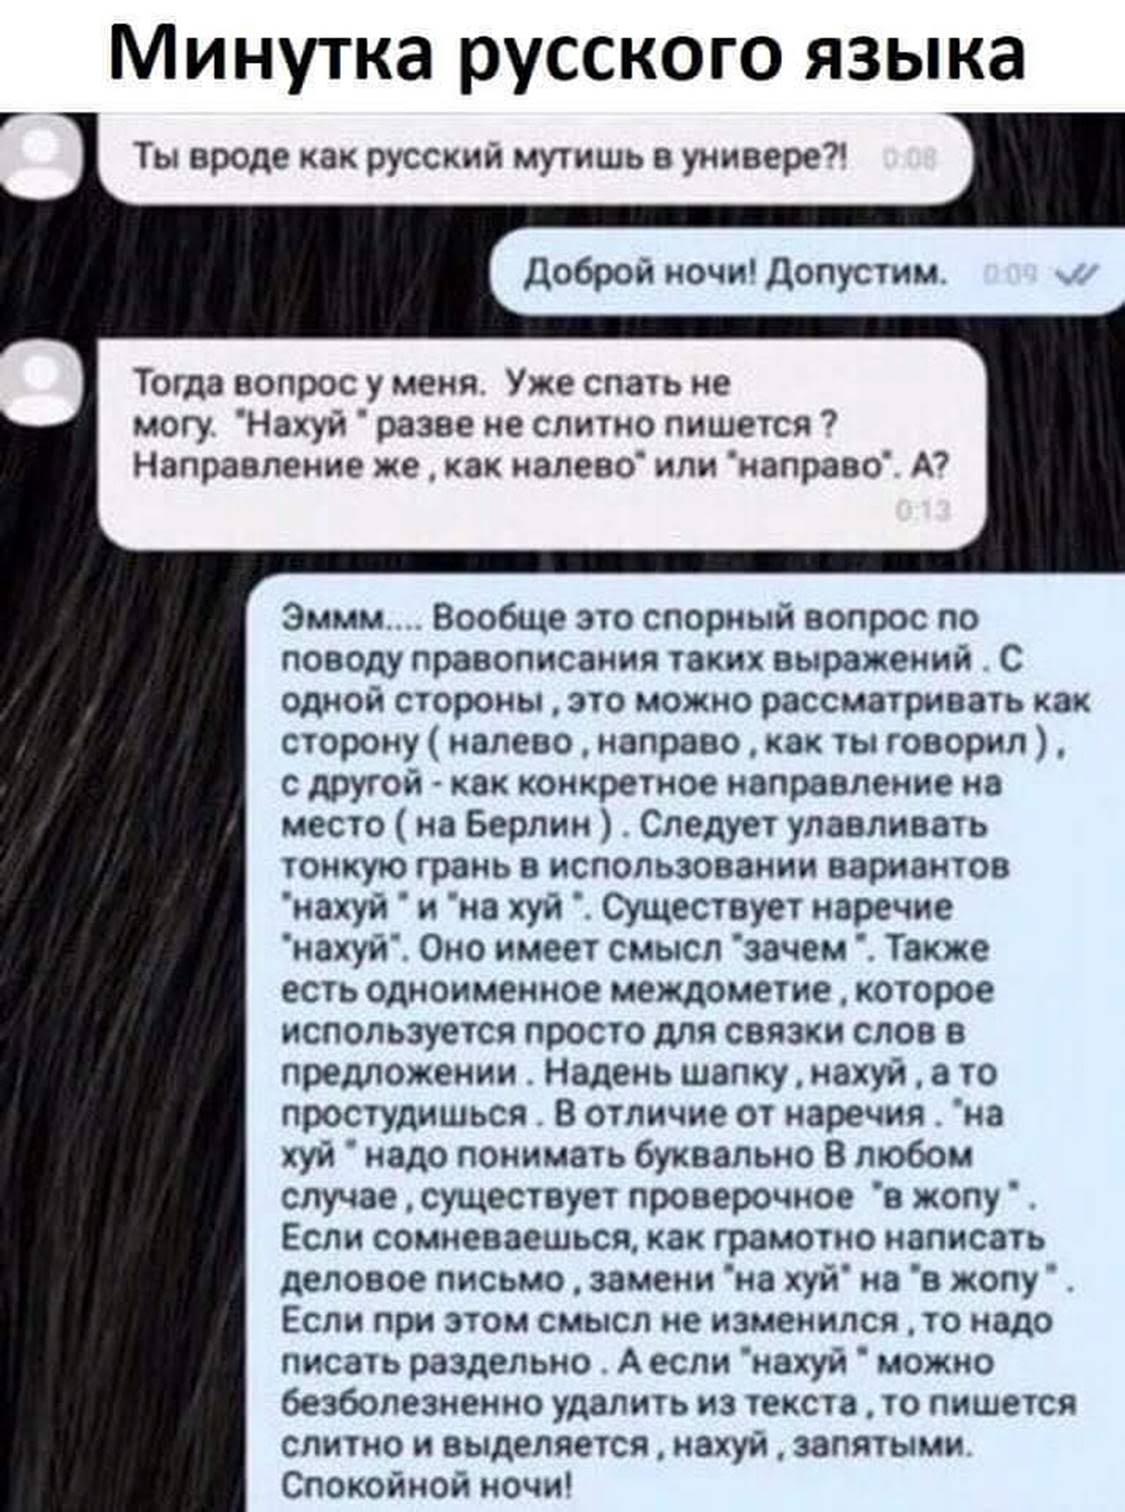 https://ic.pics.livejournal.com/andrey_kuprikov/22710770/826012/826012_original.jpg